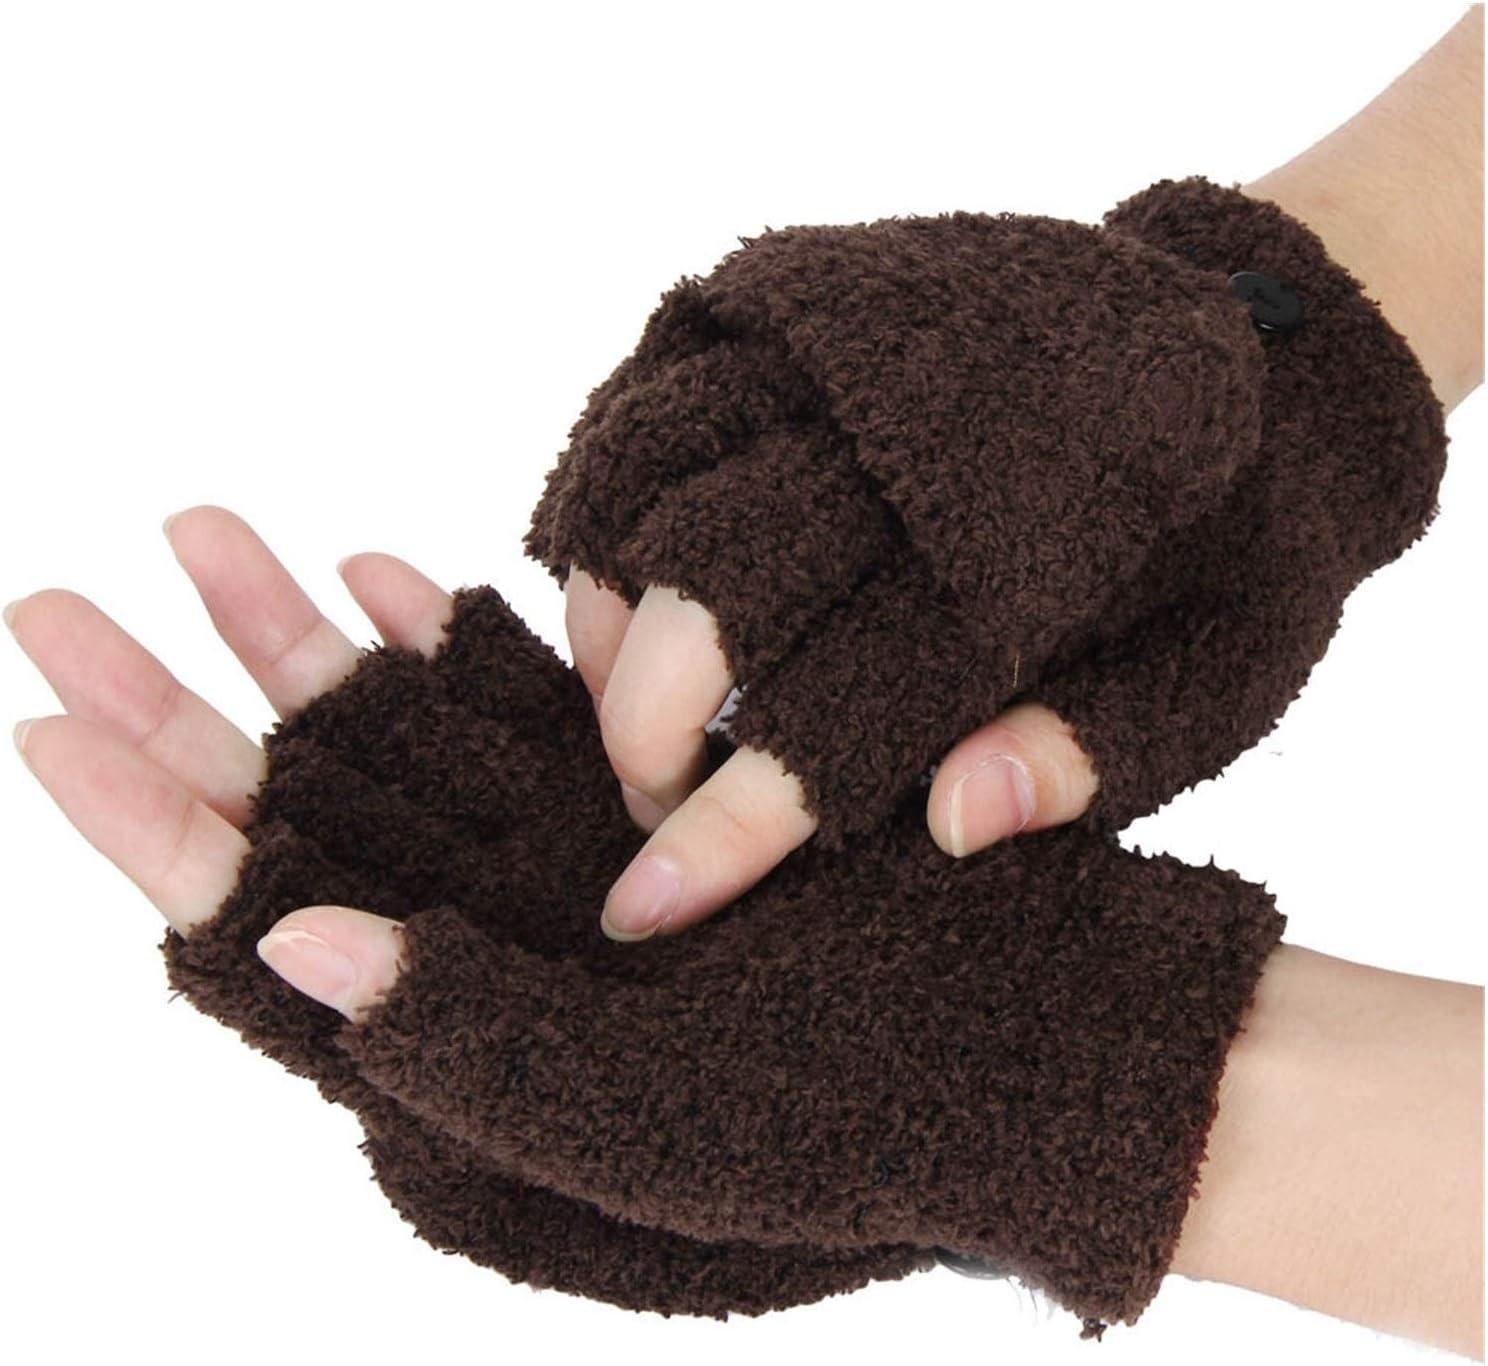 Lupovin-Keep Warm Fashion Winter Gloves Women Girls Wrist Ardent Winter Ladies Fingerless Gloves Mittens Ladies Half Finger Gloves Winter Non-Slip (Color : CO)